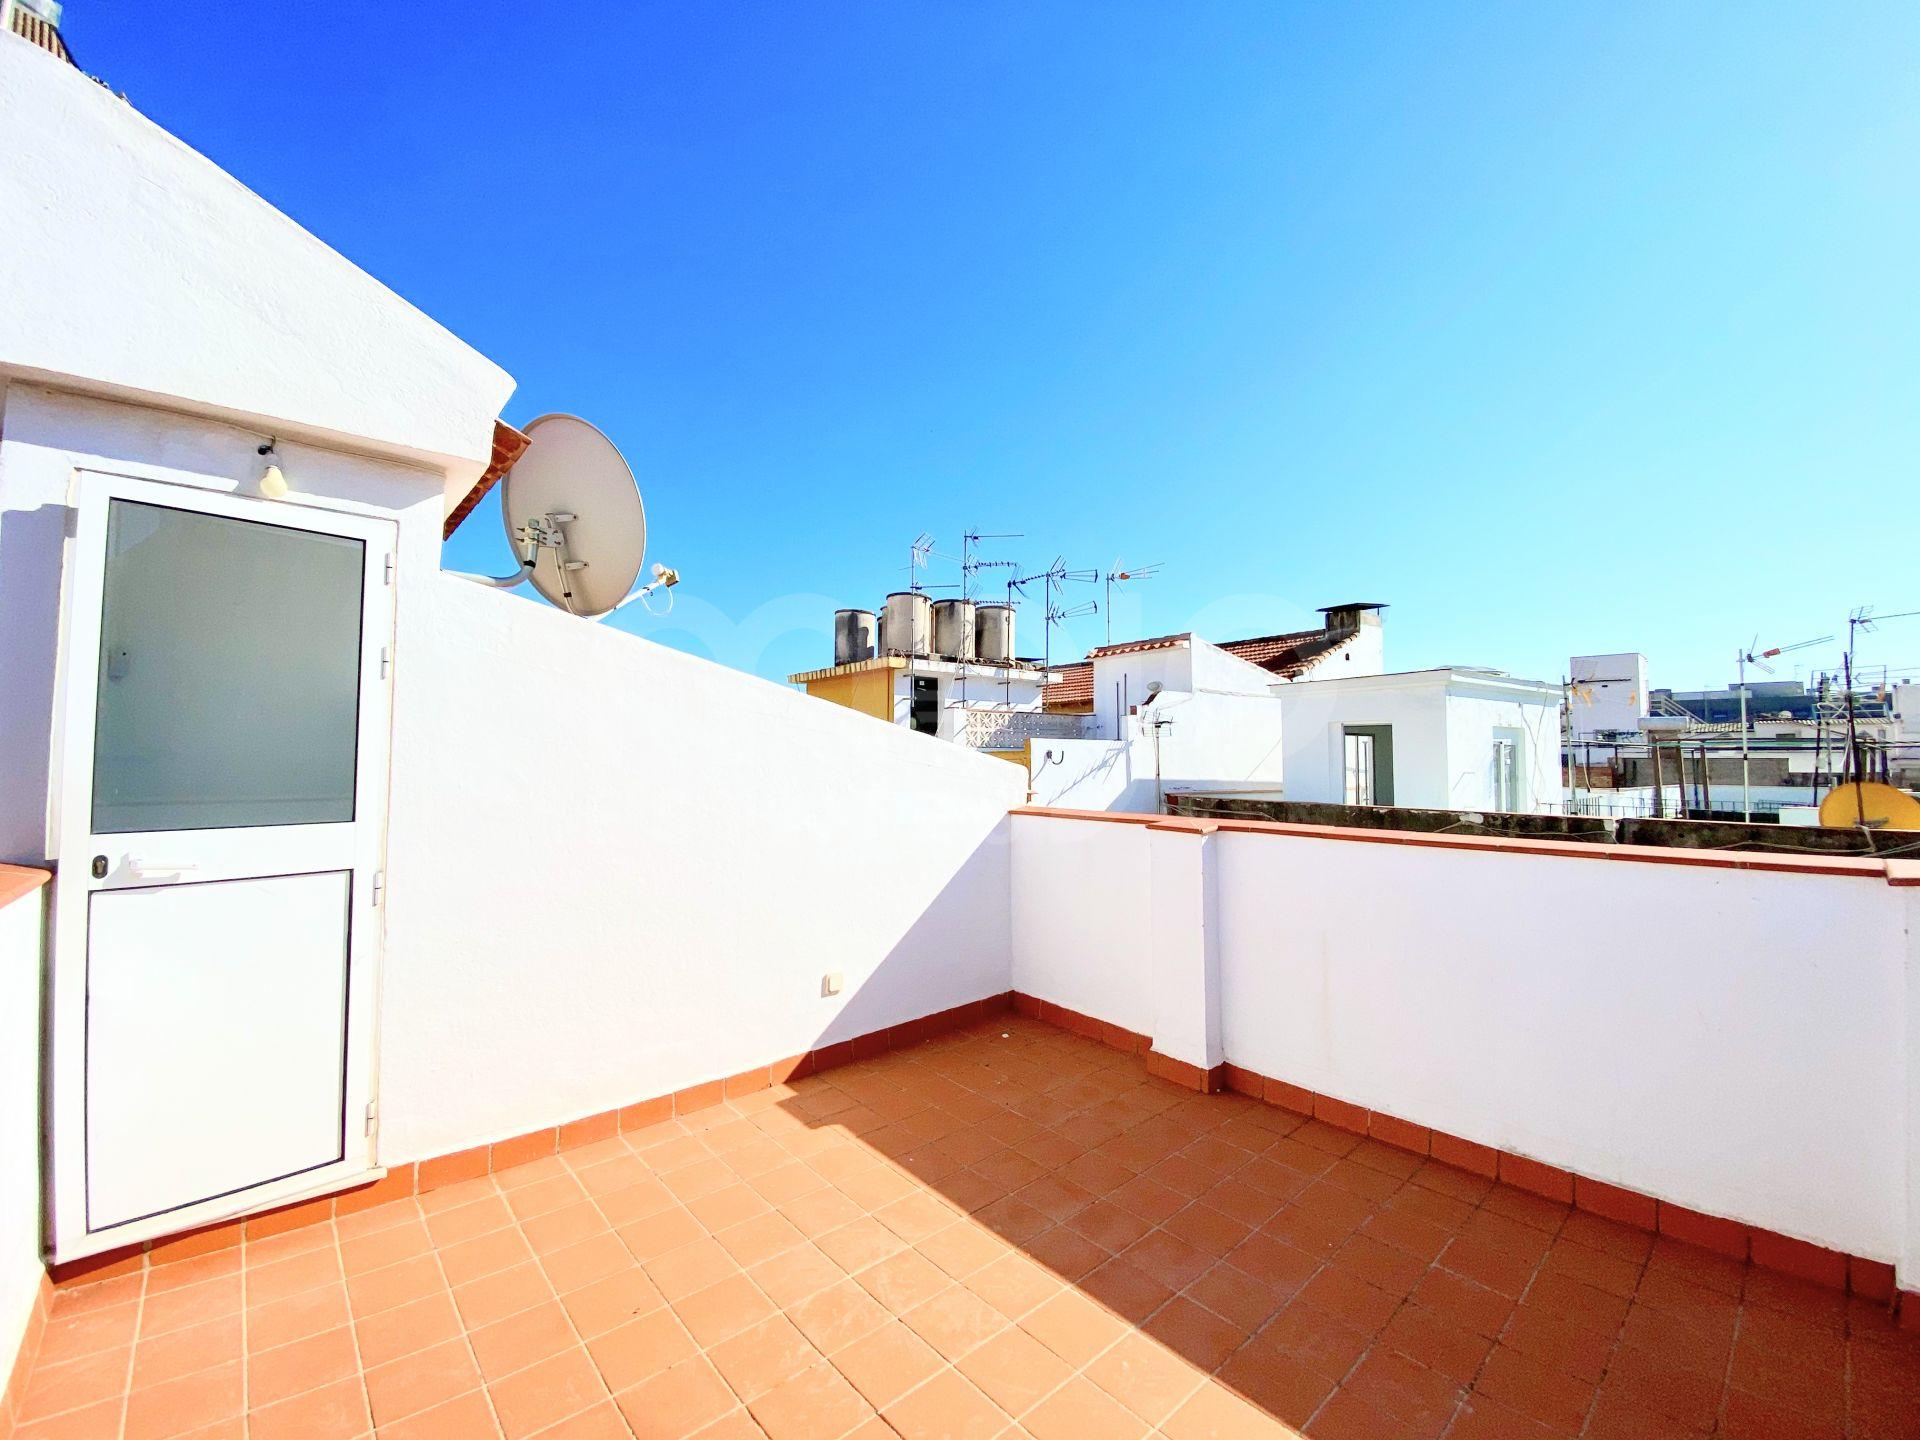 Duplex Penthouse te koop in Centro Histórico, Malaga - Centro